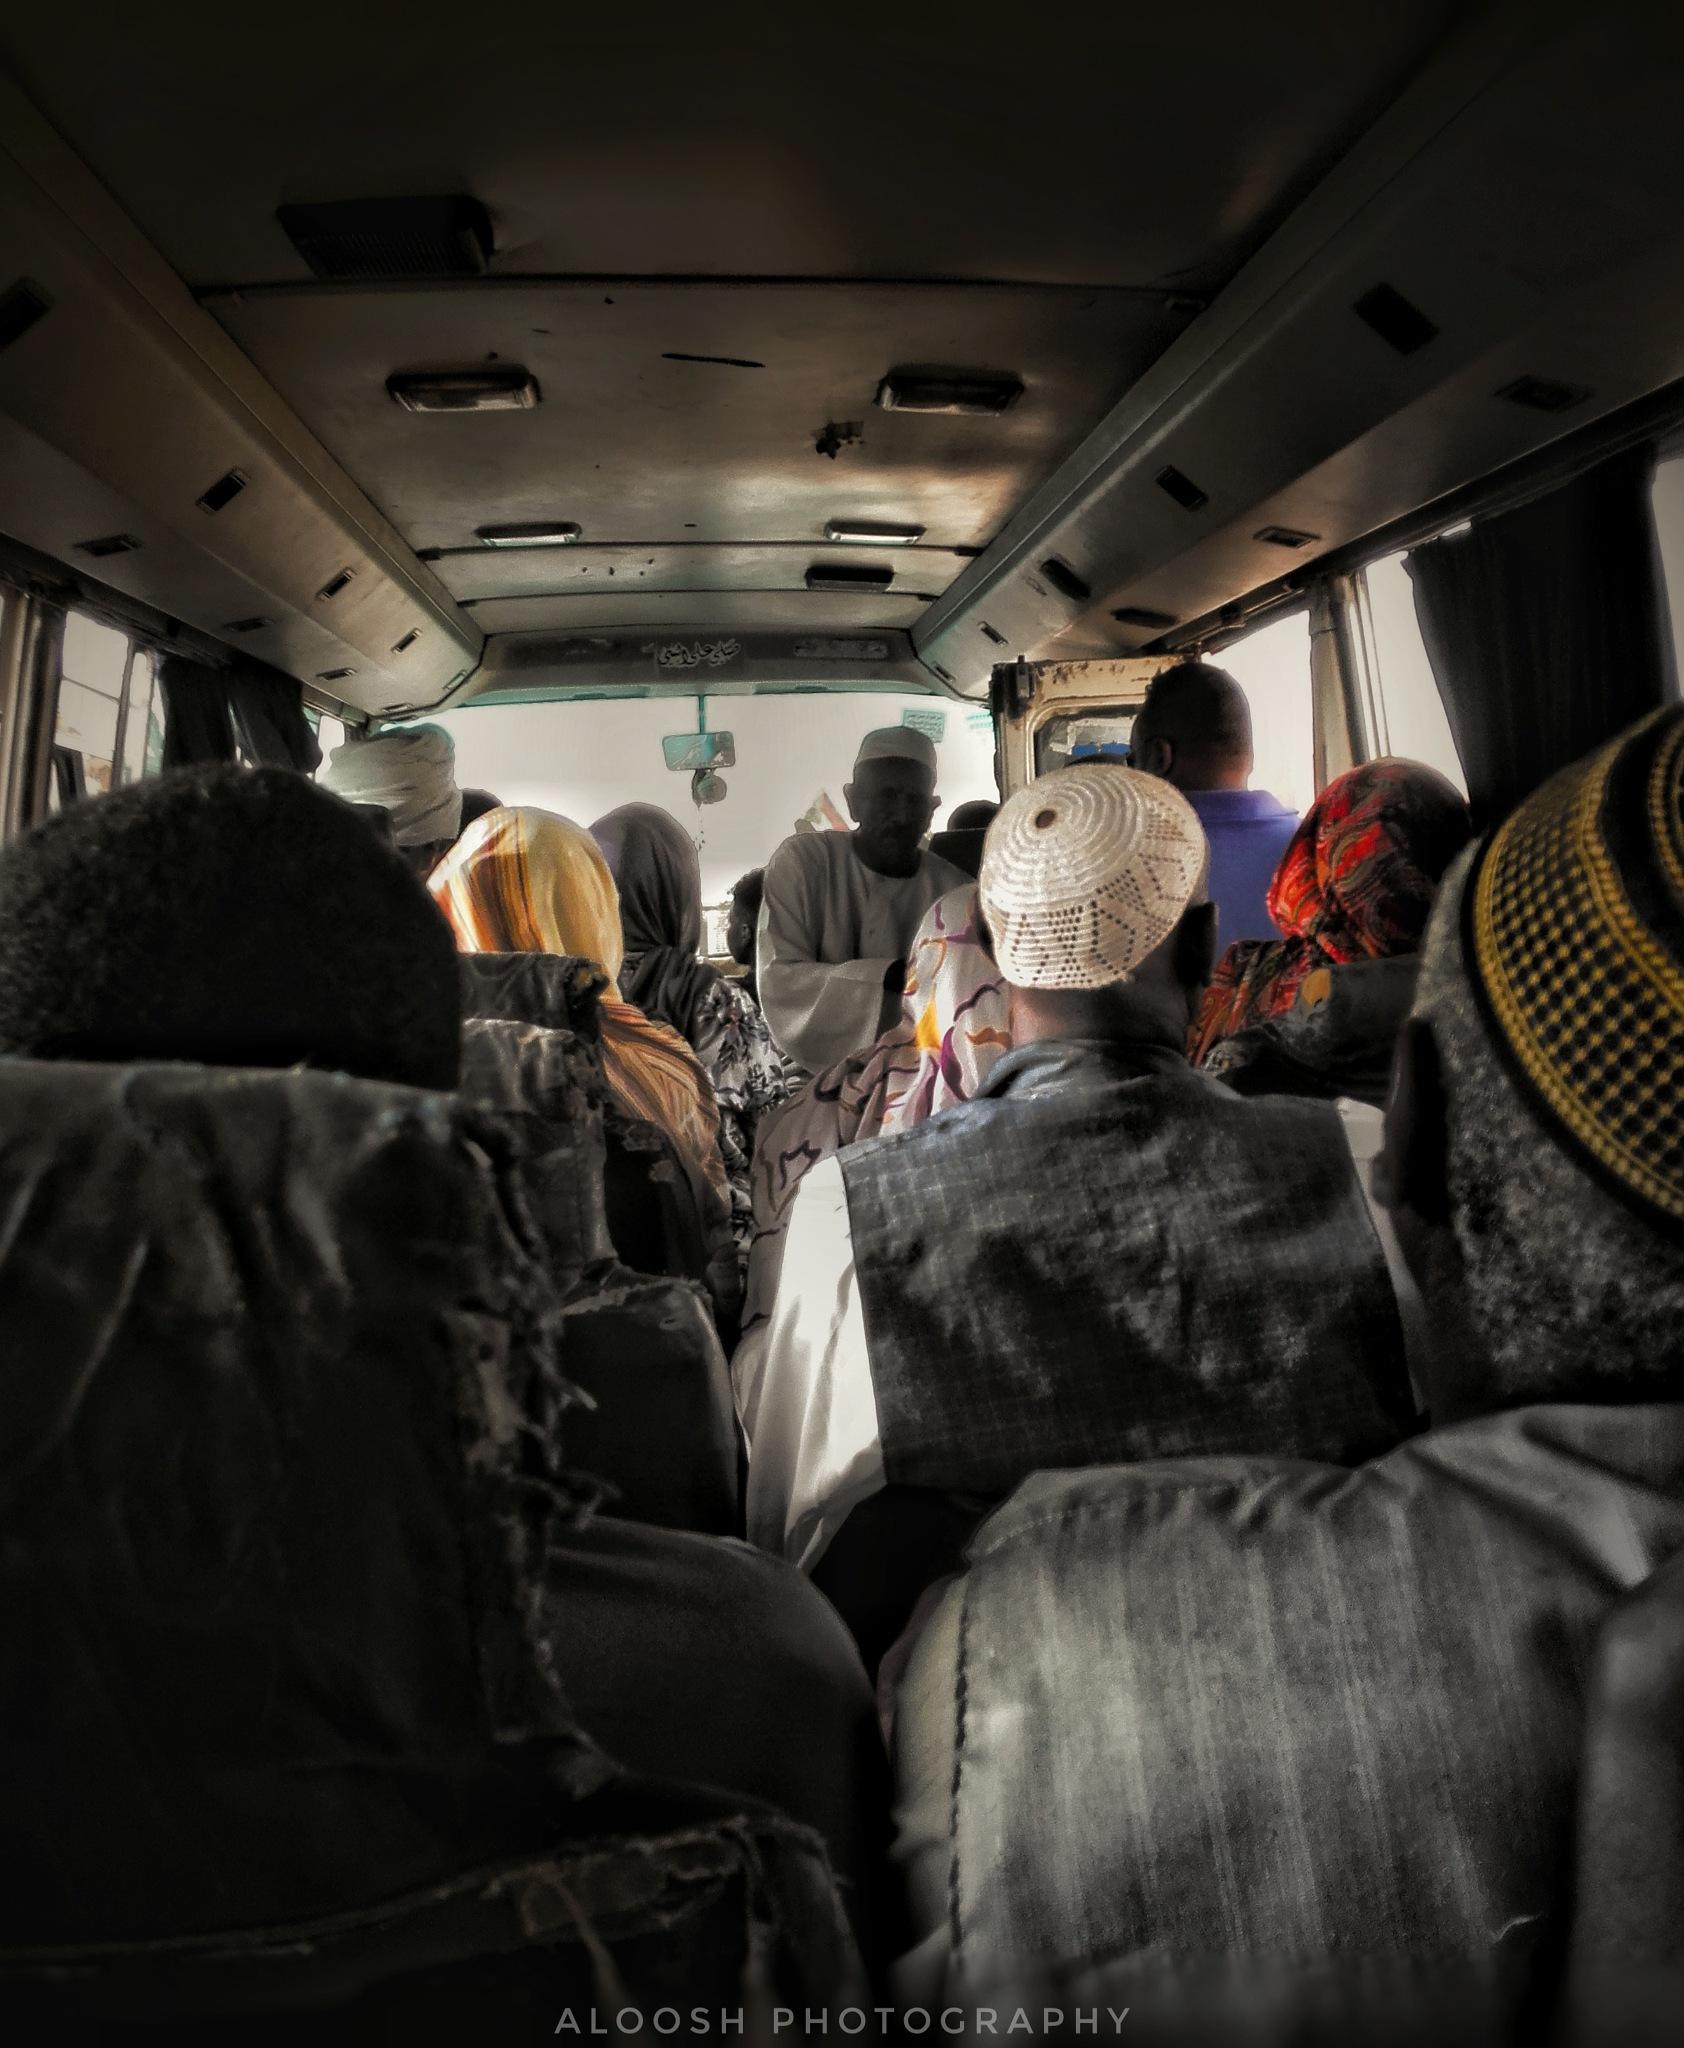 Inside bus in Khartoum city by Ali Senged